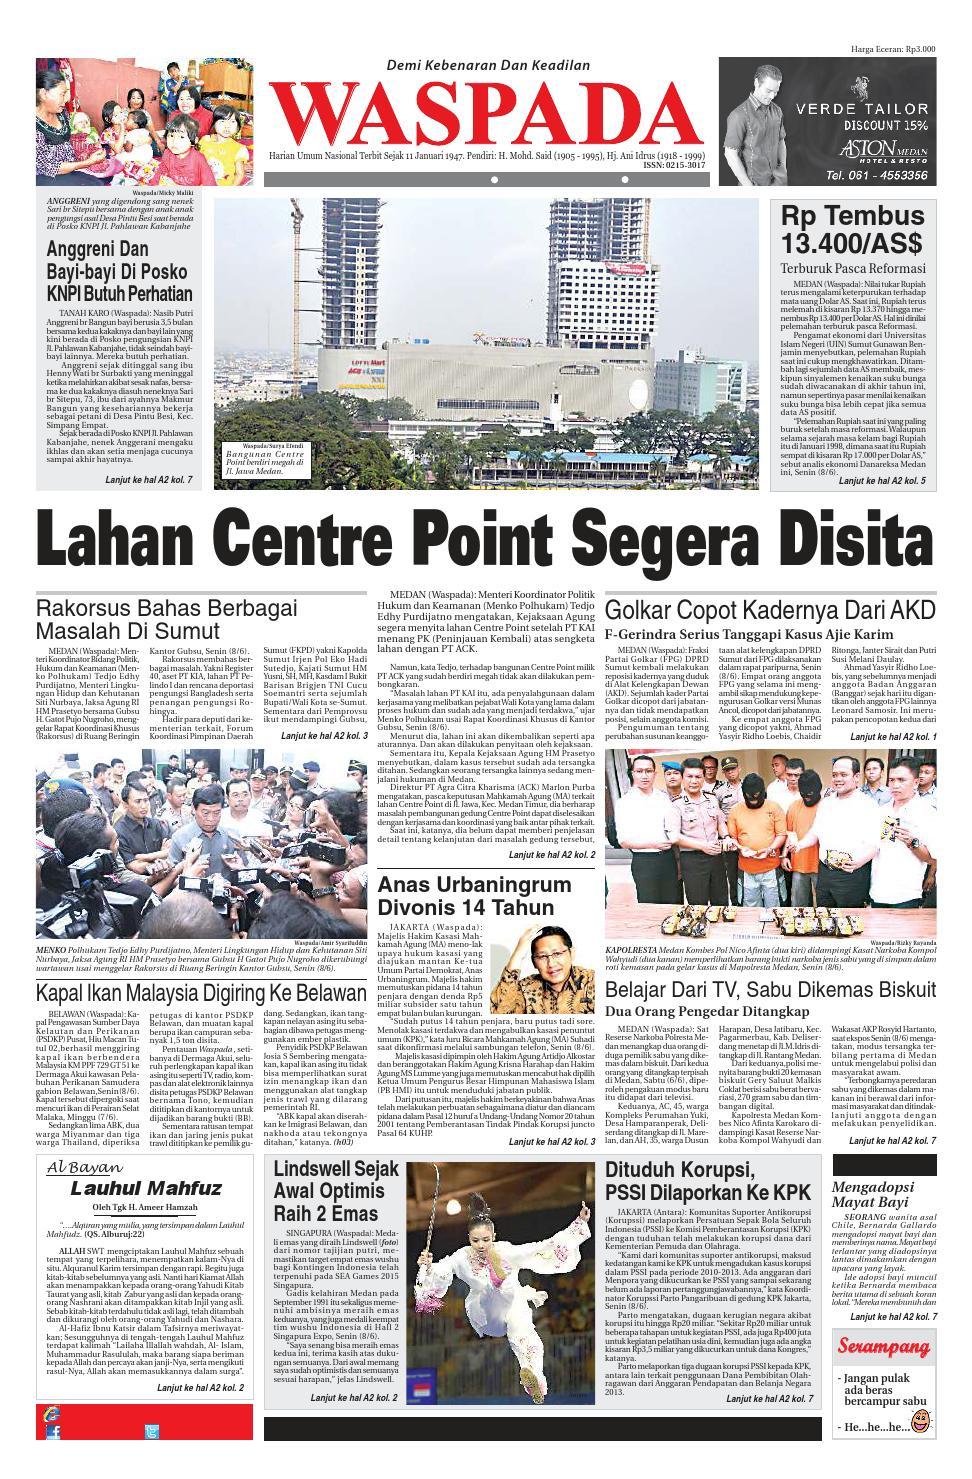 Waspada Selasa 9 Juni 2015 By Harian Issuu Produk Ukm Bumn Tas Ransel Threepoint